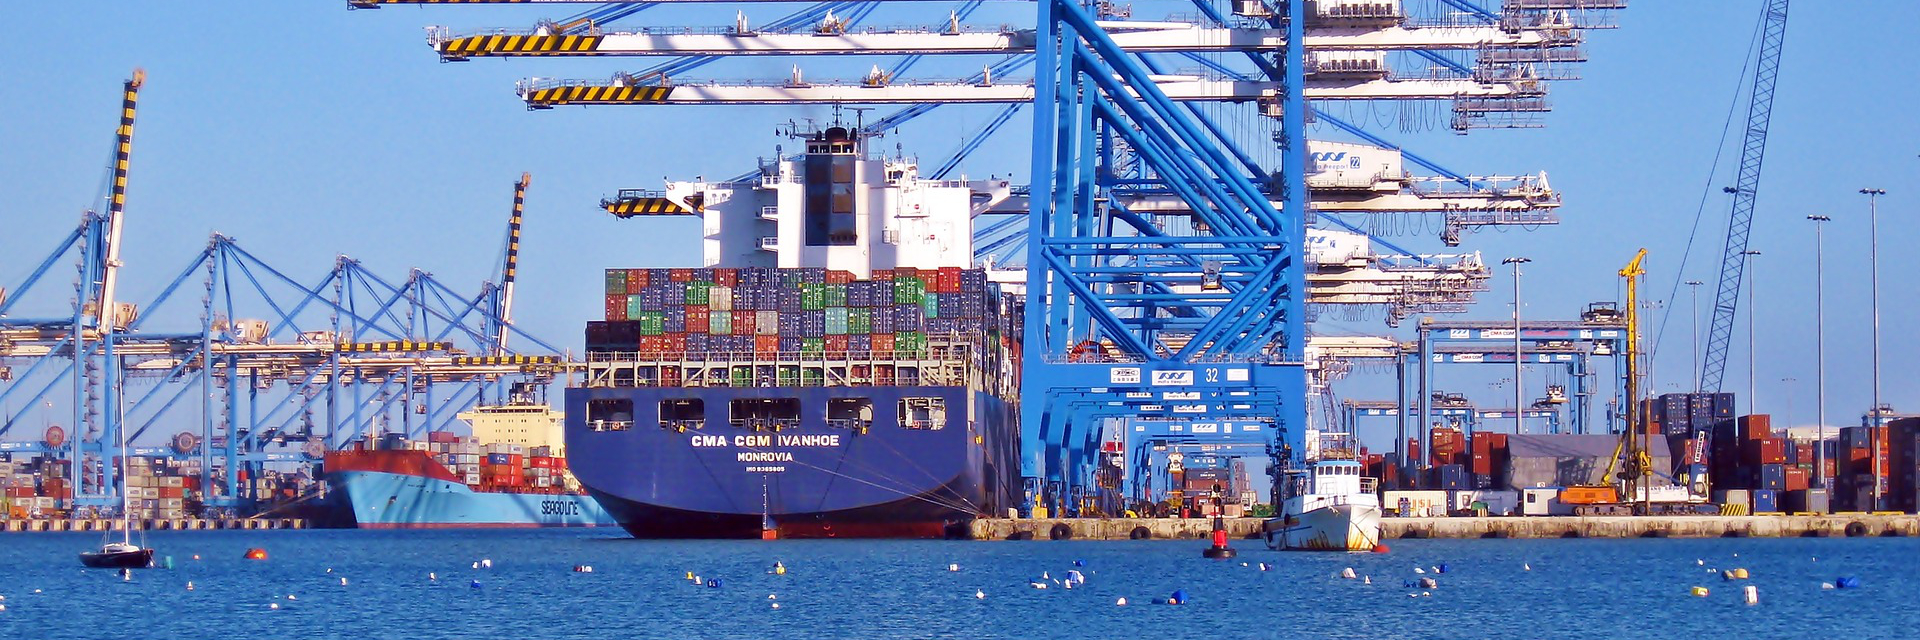 dock-1920x640